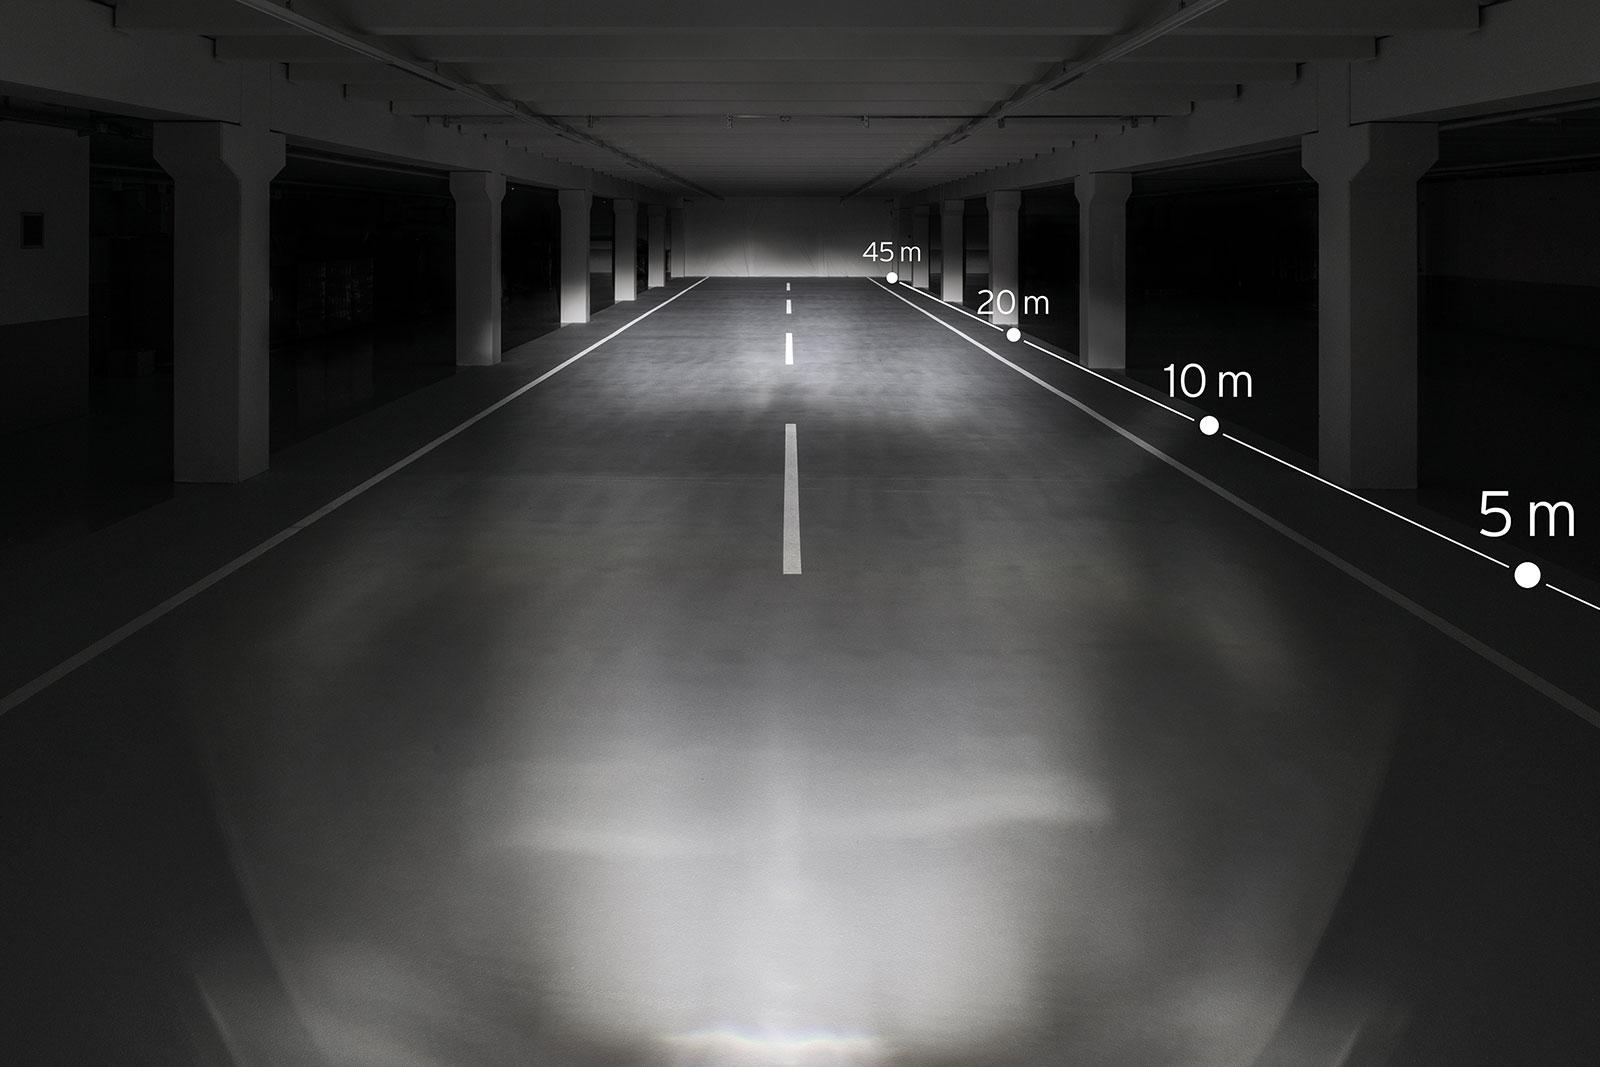 4006021008861-BUSCH-M-LLER-Lumotec-Luxos-IQ2-B-LED-Frontlampe-mit-StVZO-Zulassung-820479-08AllllKa1RWXgM